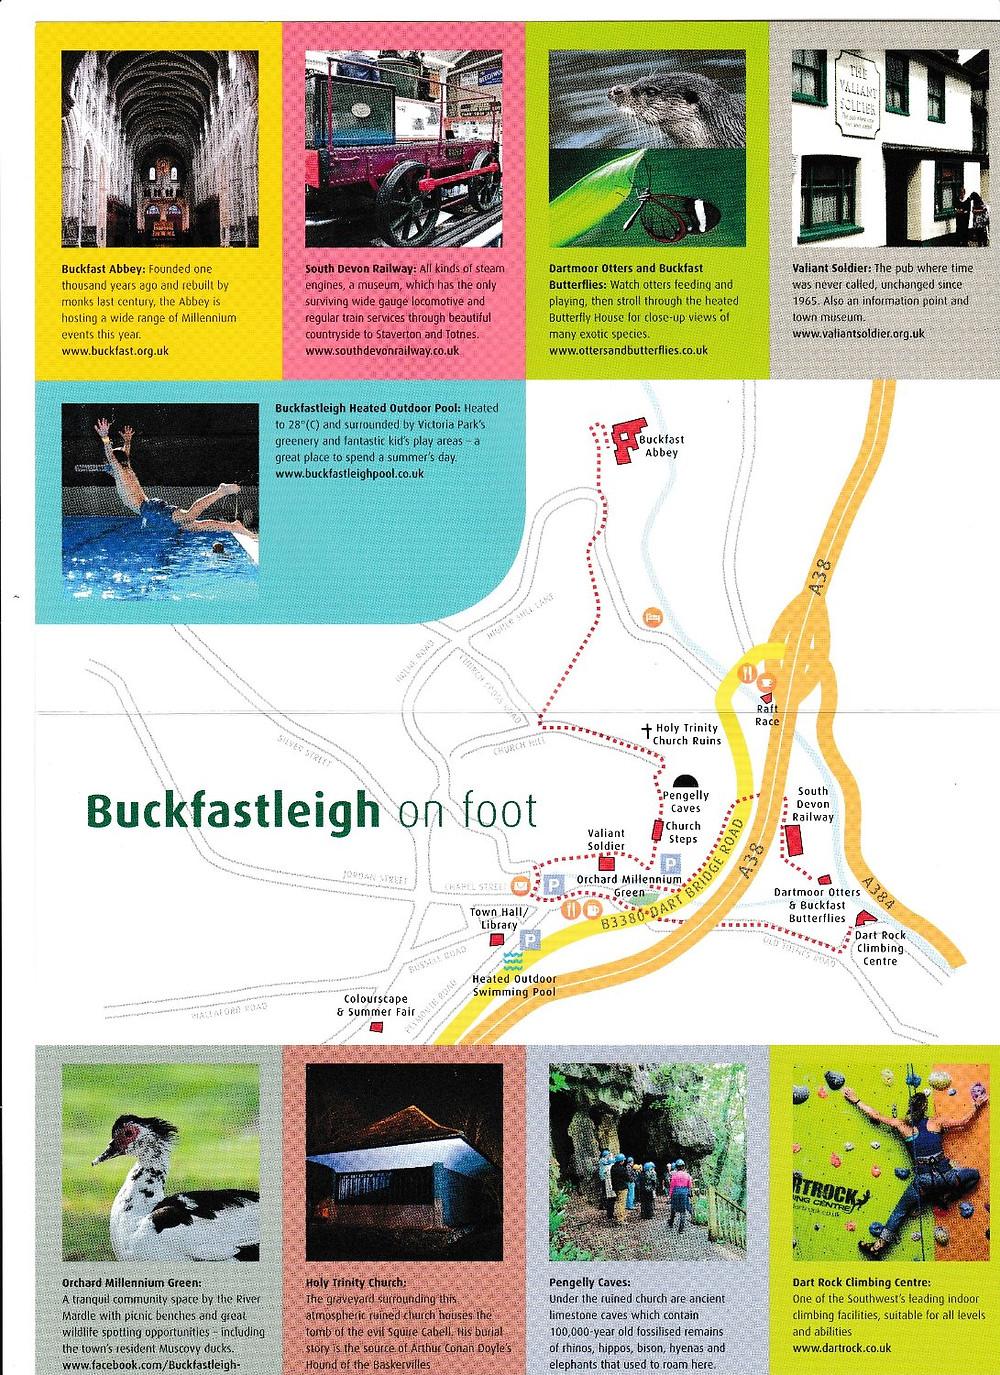 Buckfastleigh local attractions